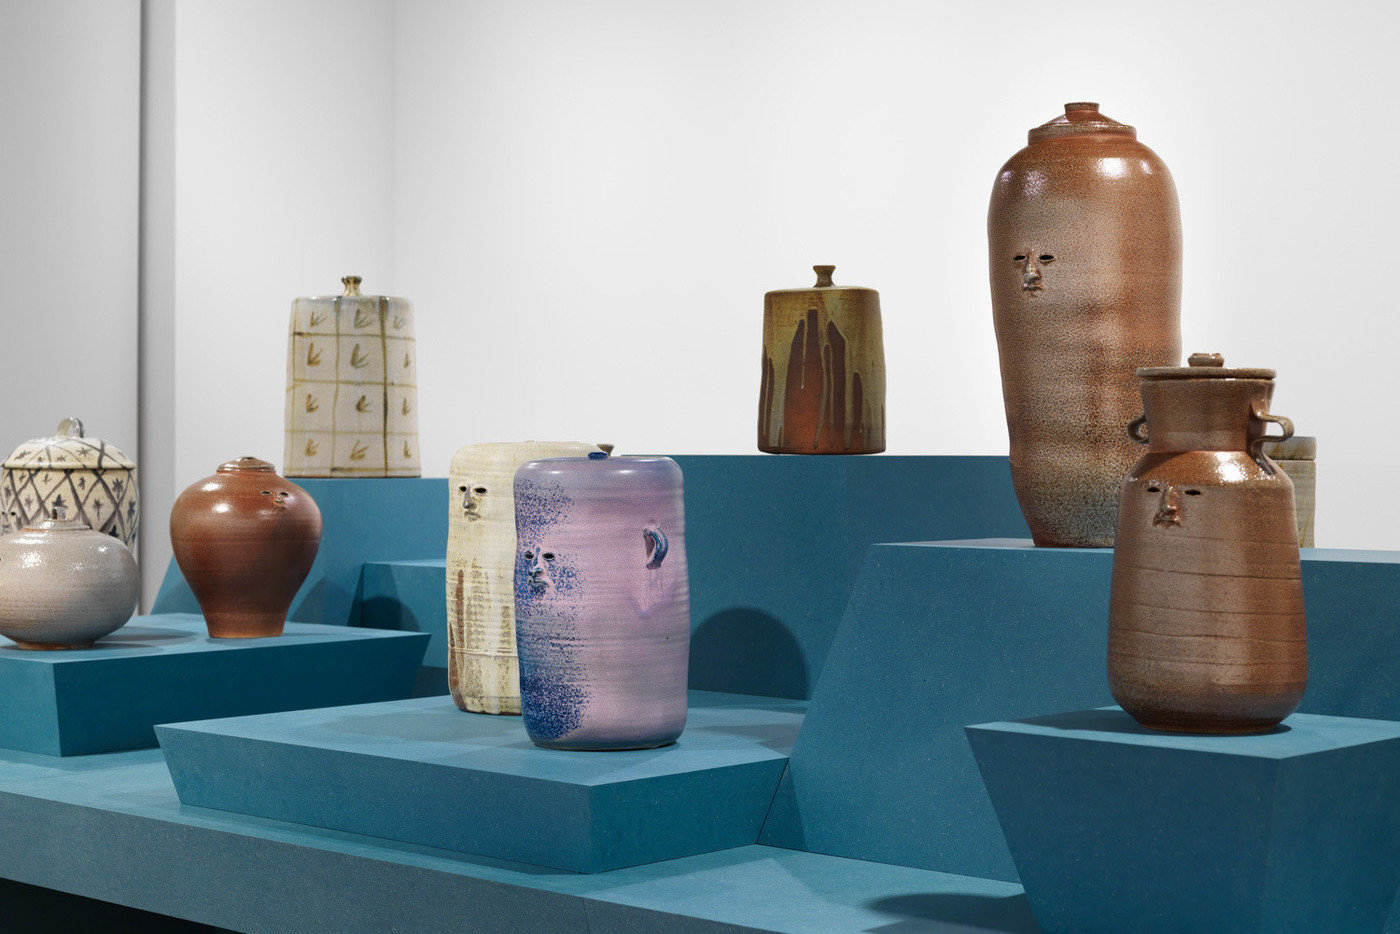 Francis Upritchard: Pots